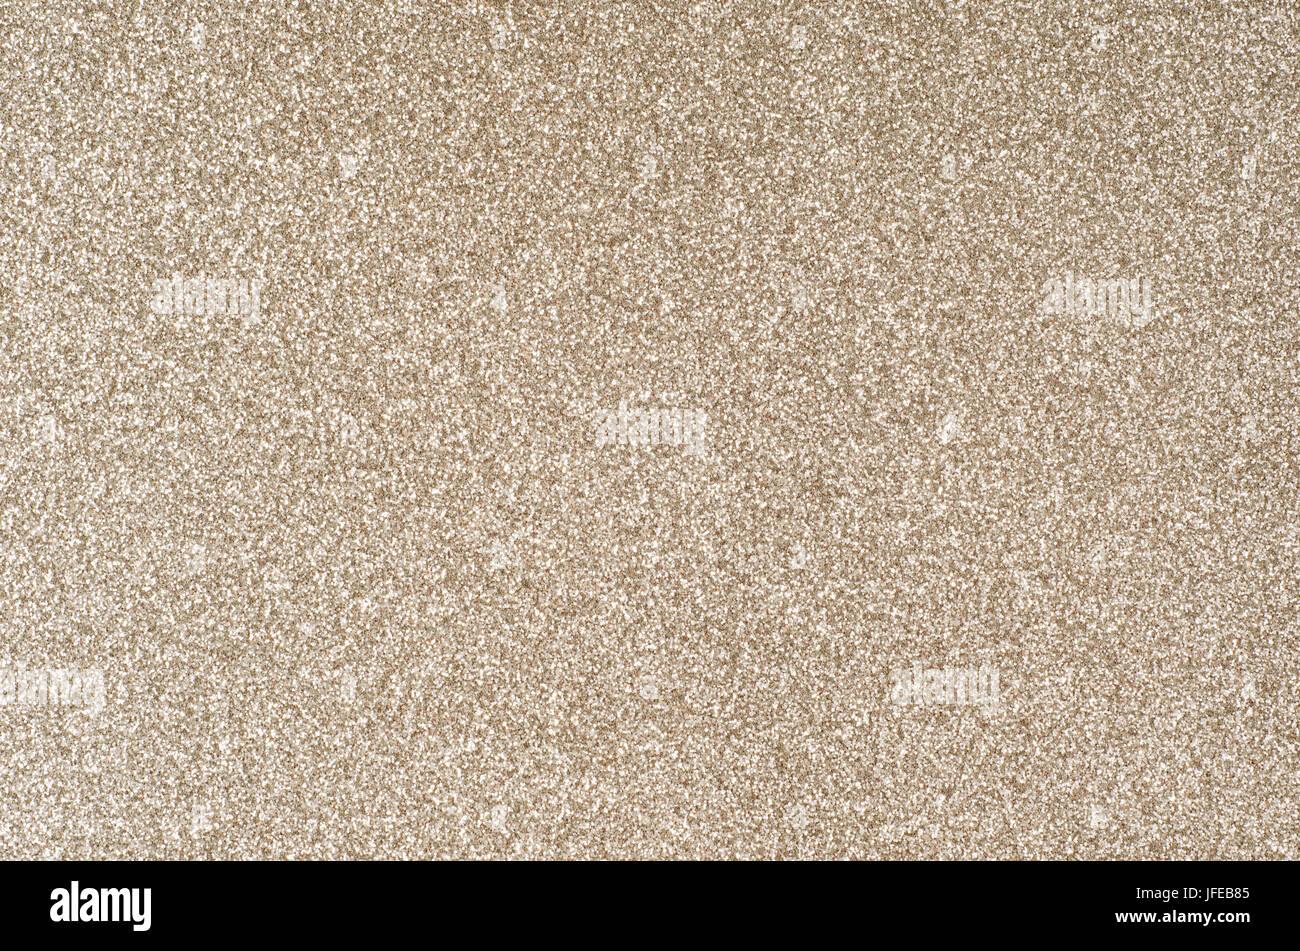 Glitter Texture Stockfotos & Glitter Texture Bilder - Alamy